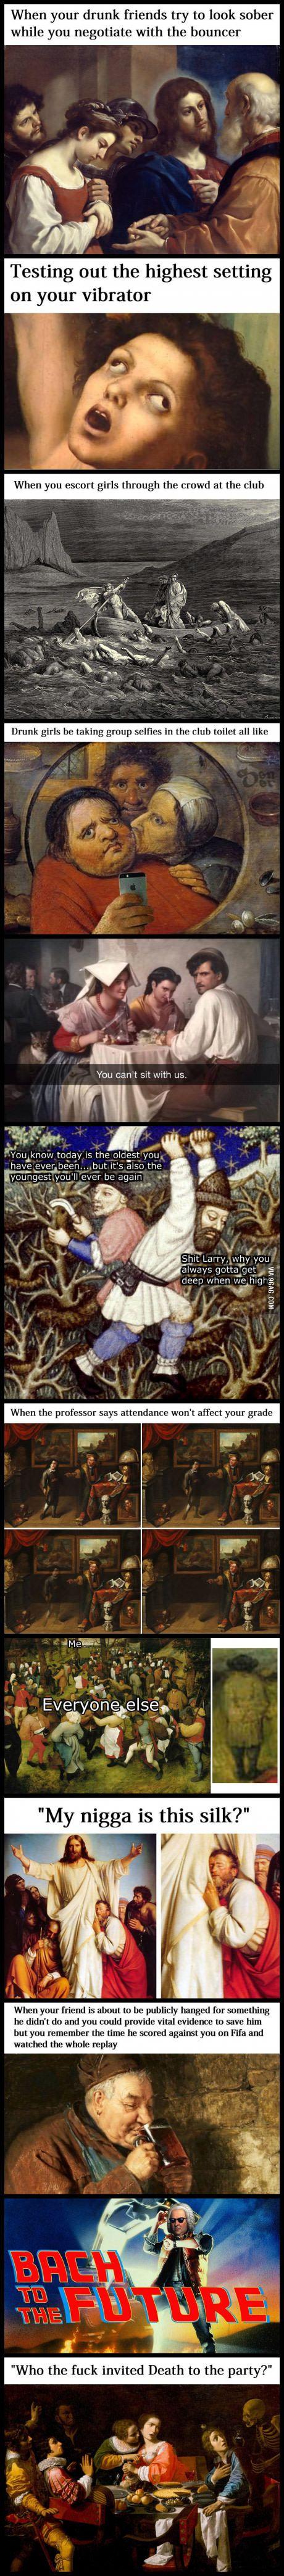 Classical Art Memes Latest (Part-5)